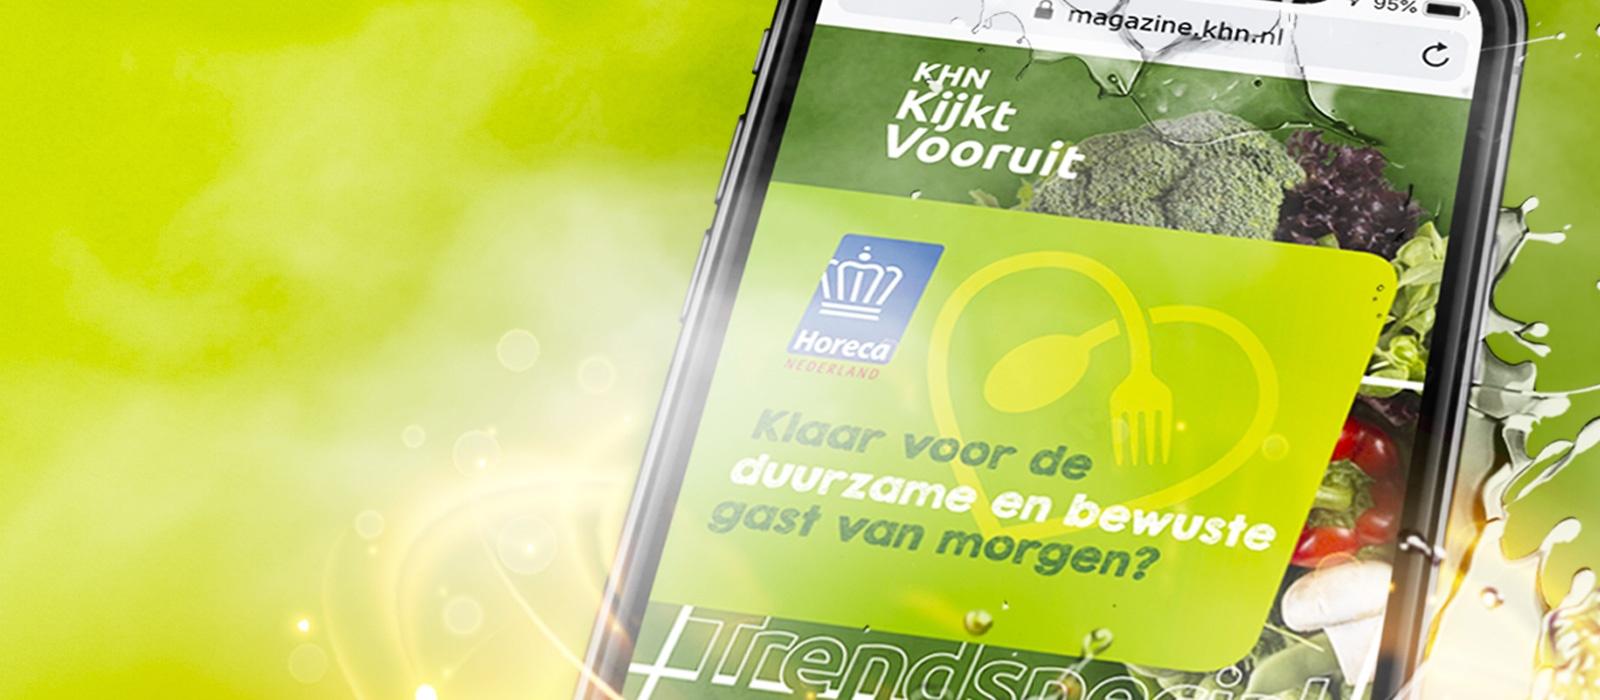 Online magazine • Koninklijke Horeca Nederland